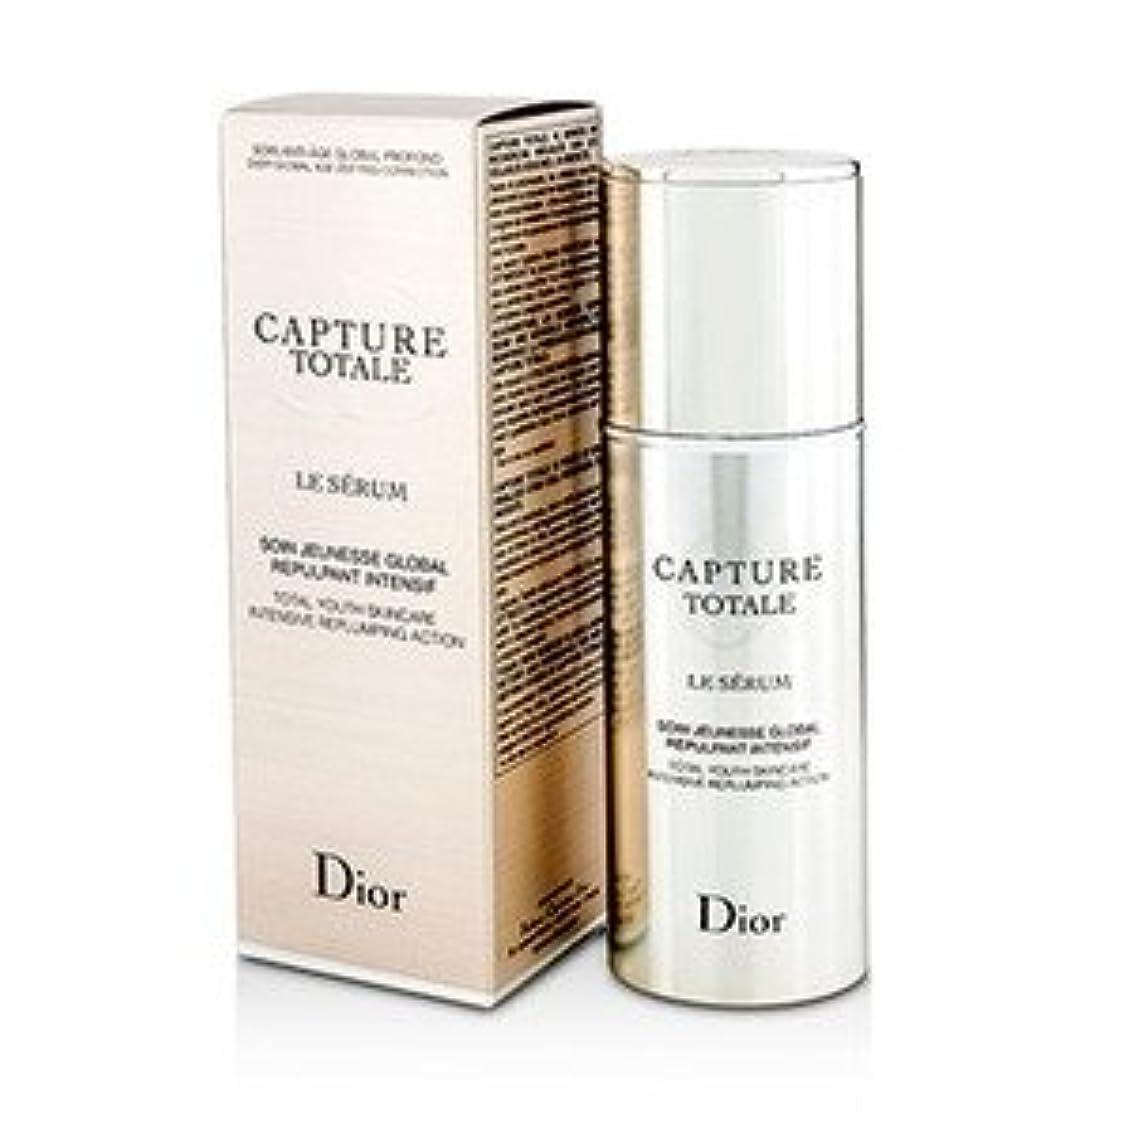 Dior(ディオール) カプチュール トータル ル セラム 50ml/1.7oz [並行輸入品]